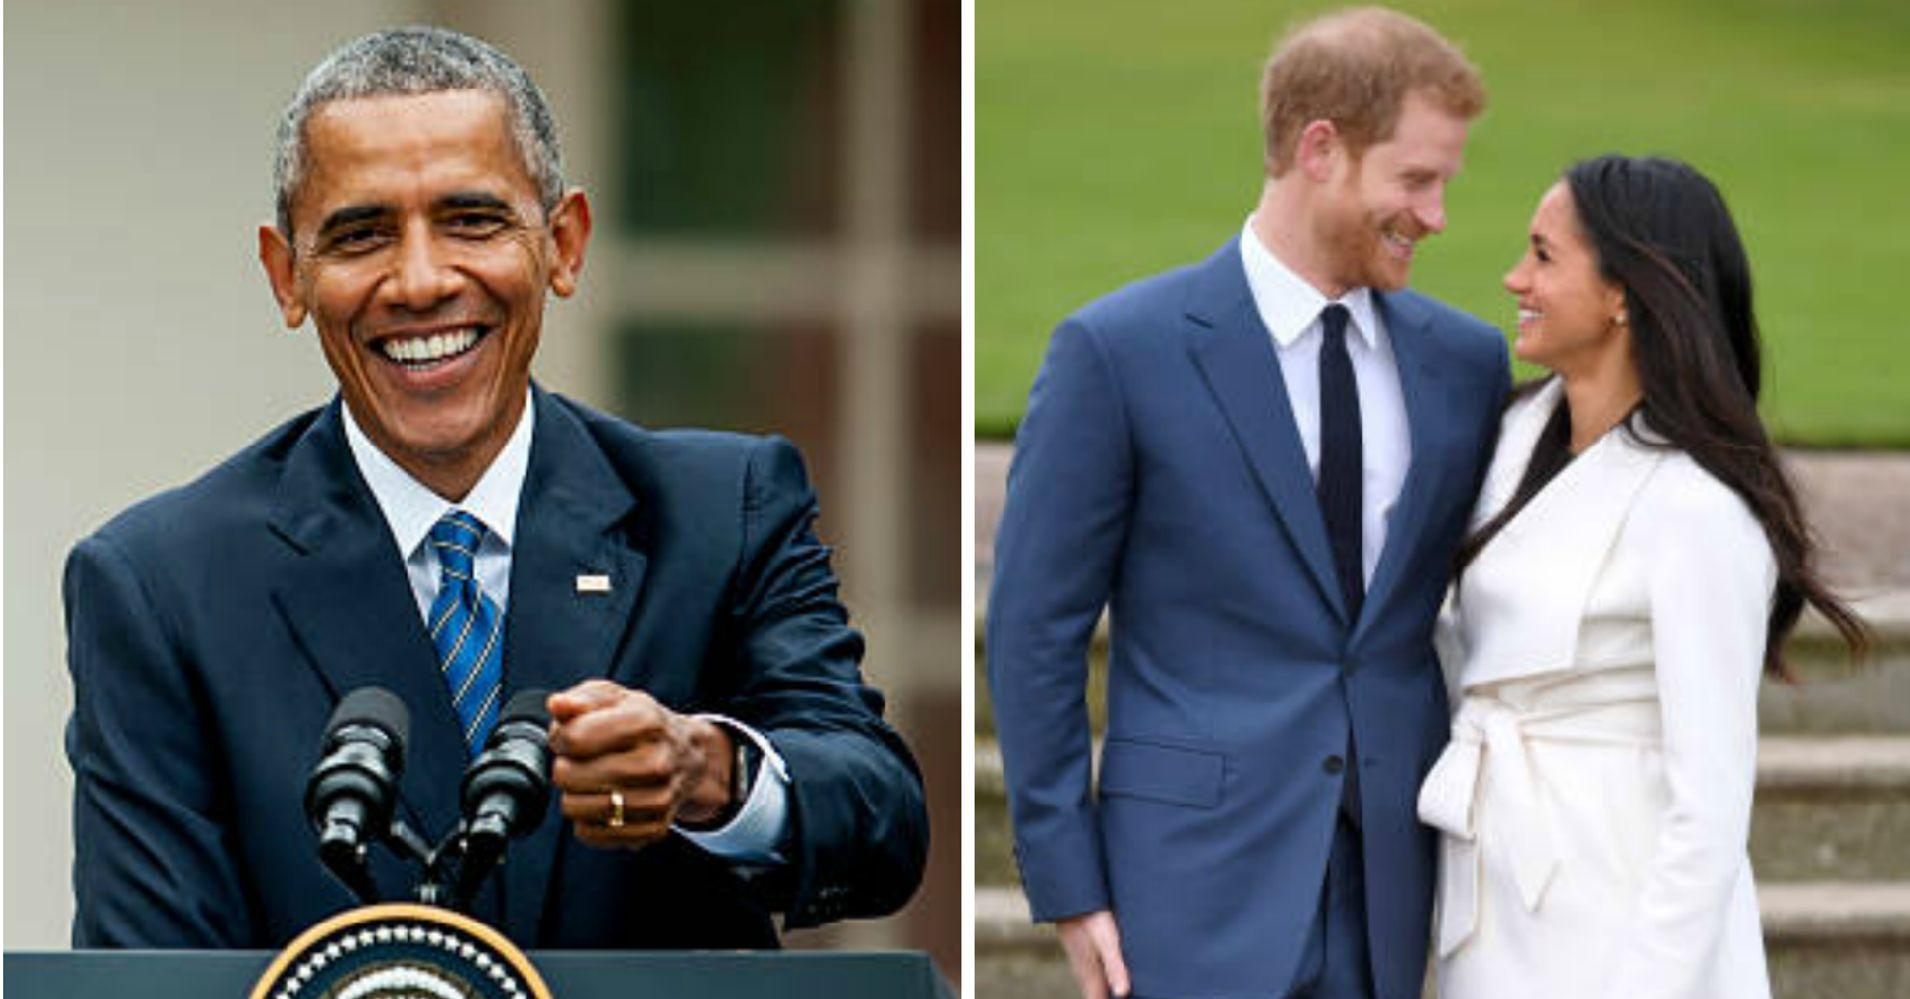 Barack Obama Congratulates Prince Harry And Meghan Markle On Engagement